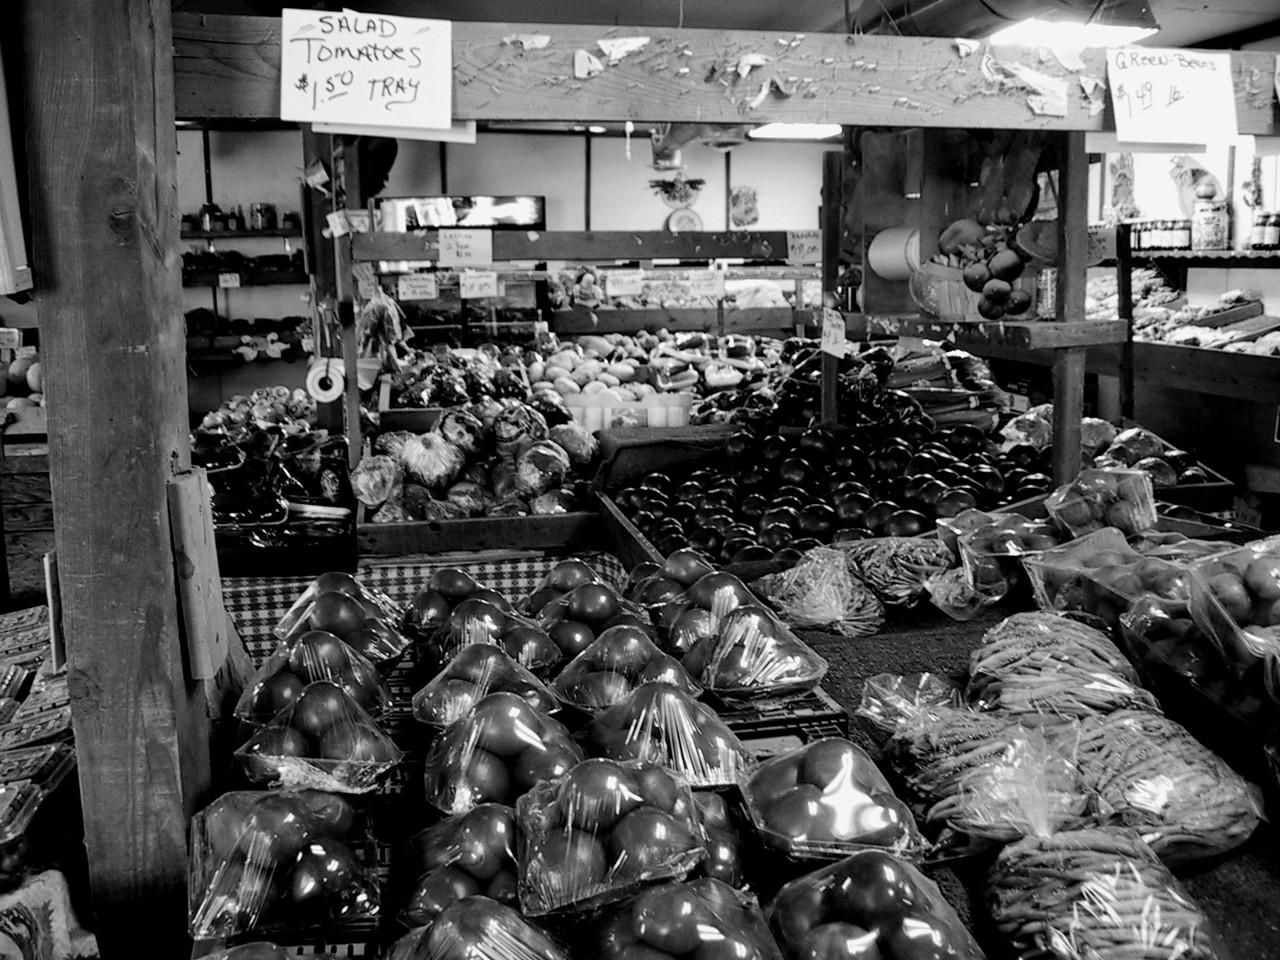 Famers' Market, Chandler, May 2001